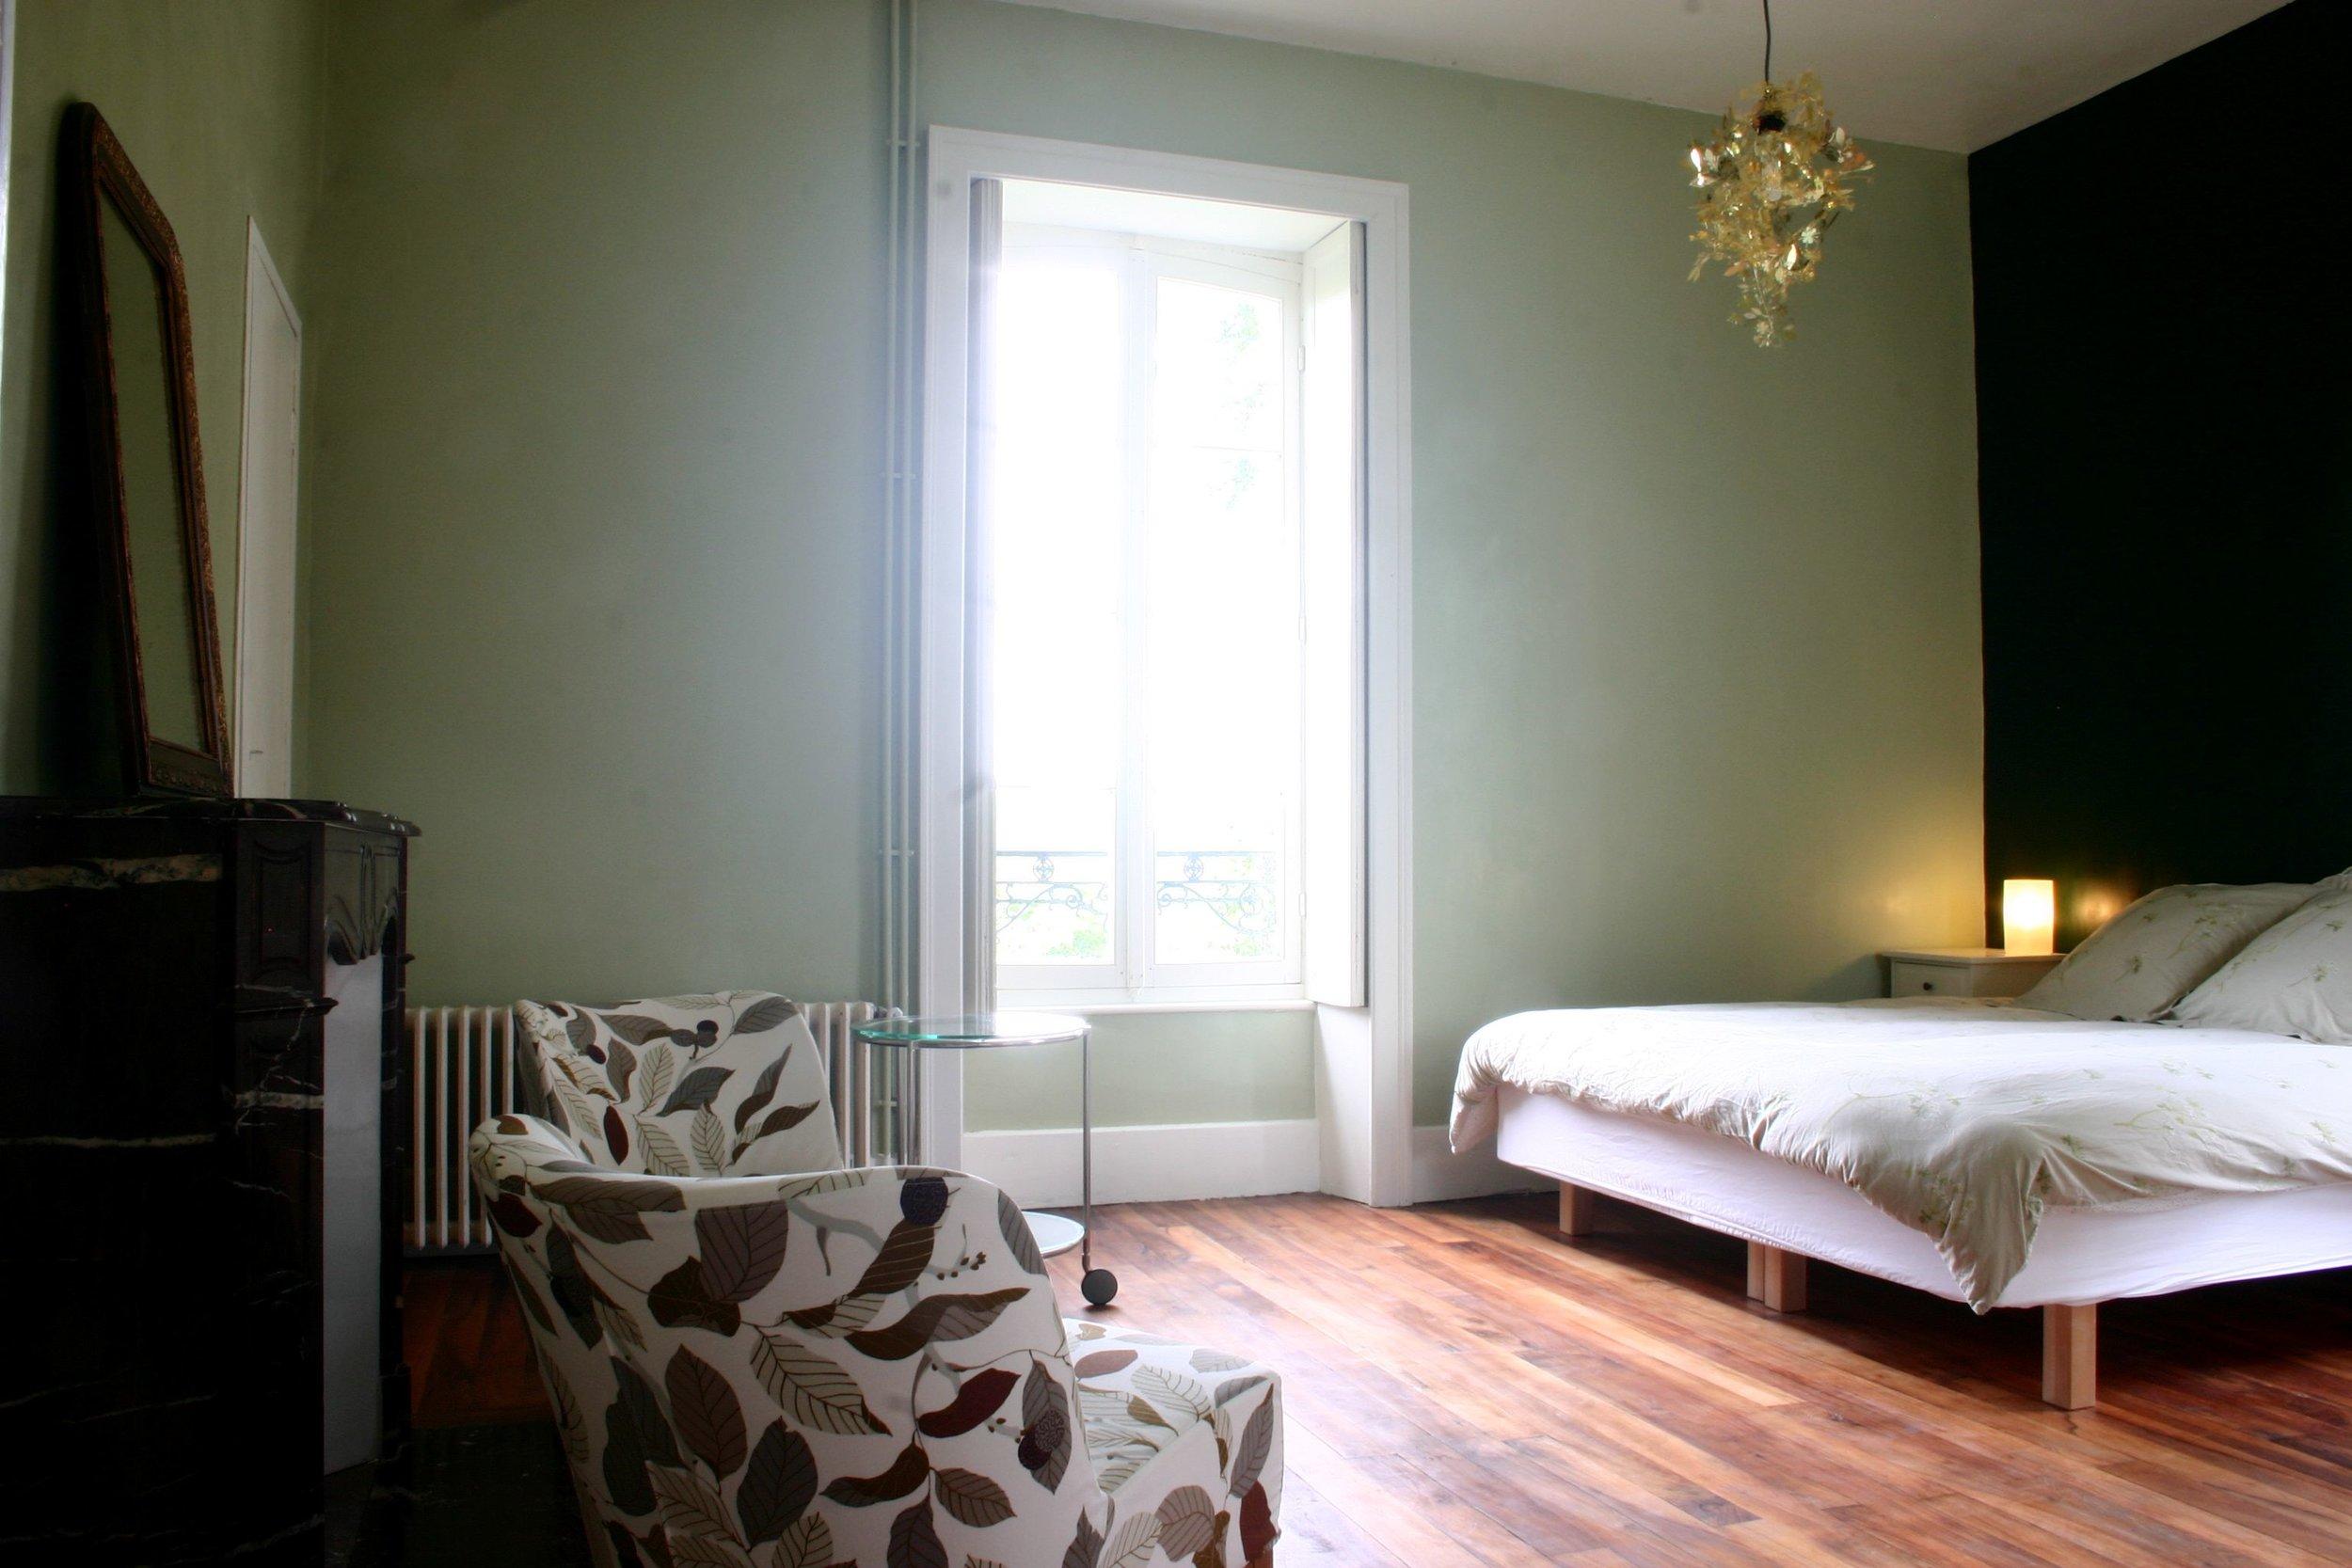 Et Chambres Familiales Spacieuses,spacious Family Rooms, ruime FamilieKamers - ...+ d'infos